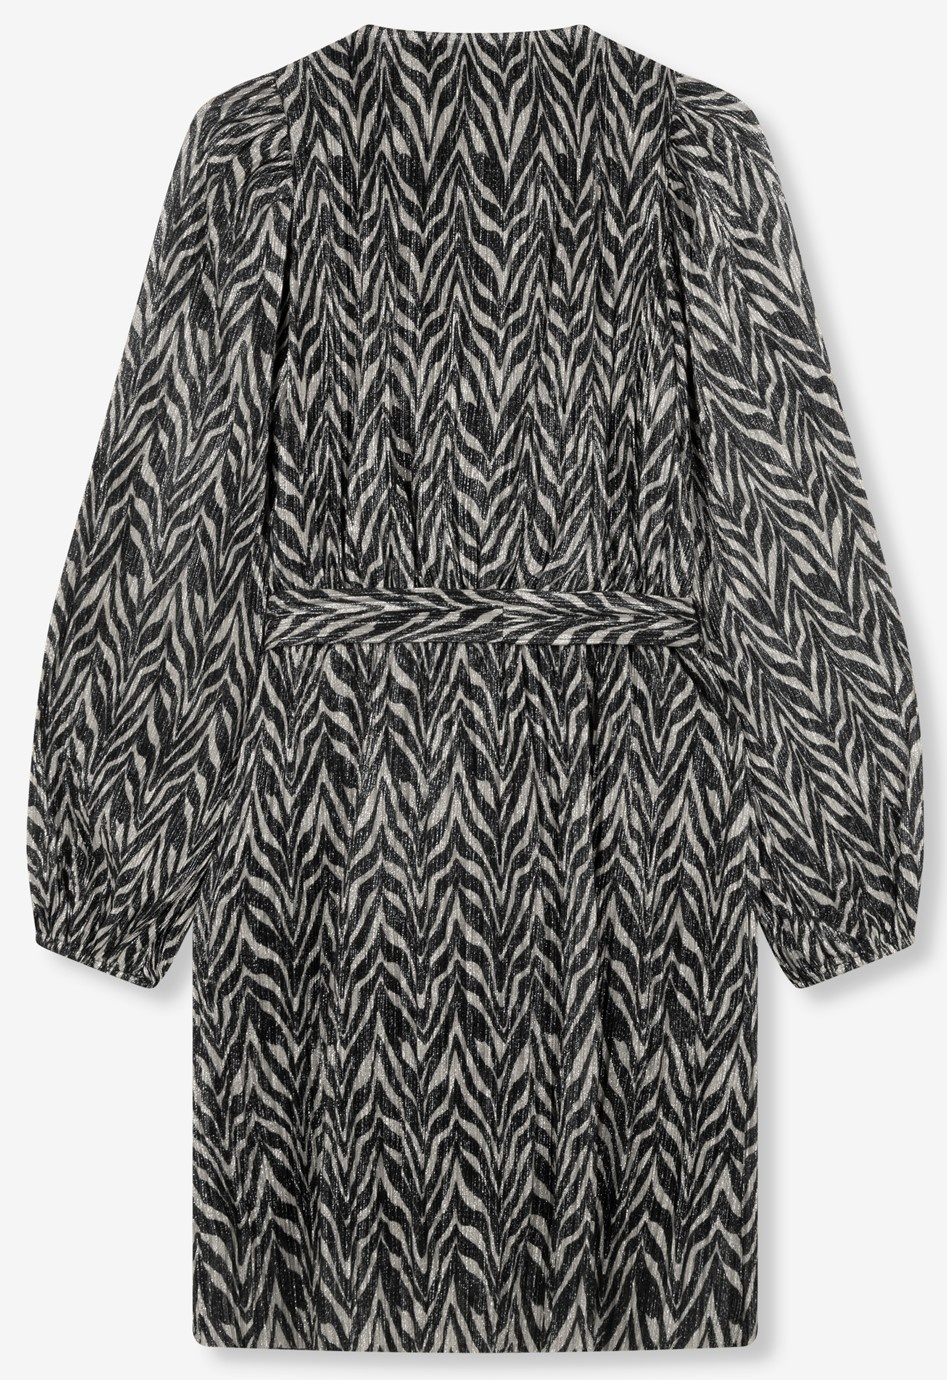 Jurk ladies knitted zebra lurex dress black-3